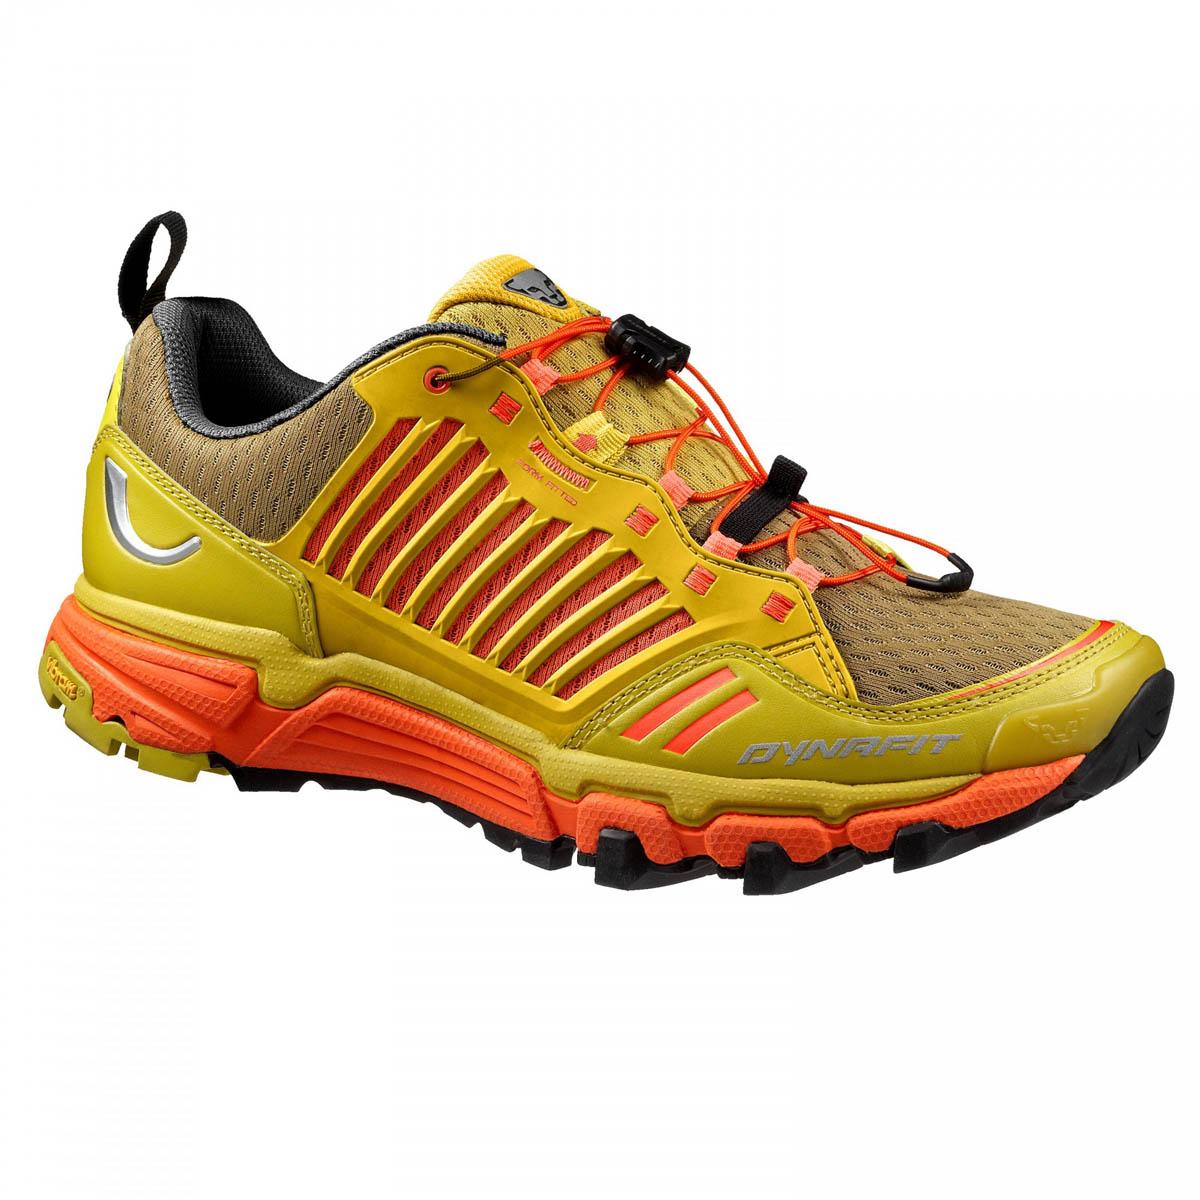 Equipement trail boutique running sports outdoor shop - Dynafit Feline Ultra Trail Running Shoe Long Distance Trail Shoes Ultra Trail Shoes